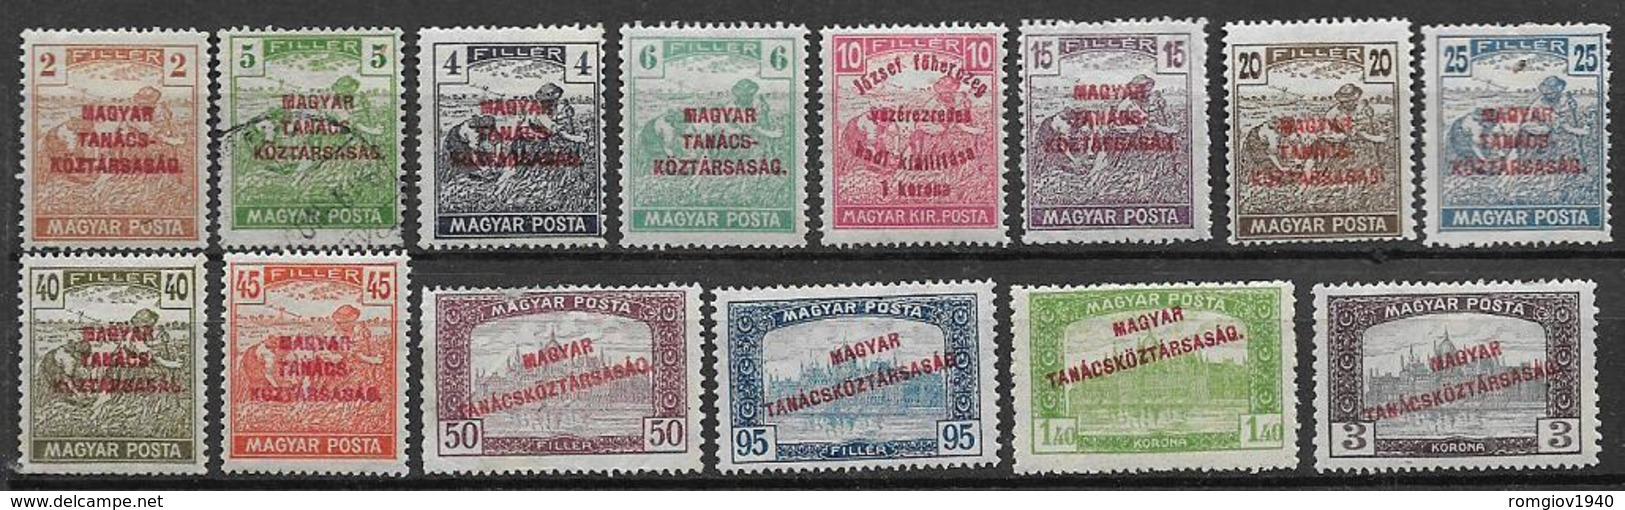 UNGHERIA  1919 SOPRASTAMPATI YVERT. 245-63 MISTA  VF NON COMPLETA - Ungheria